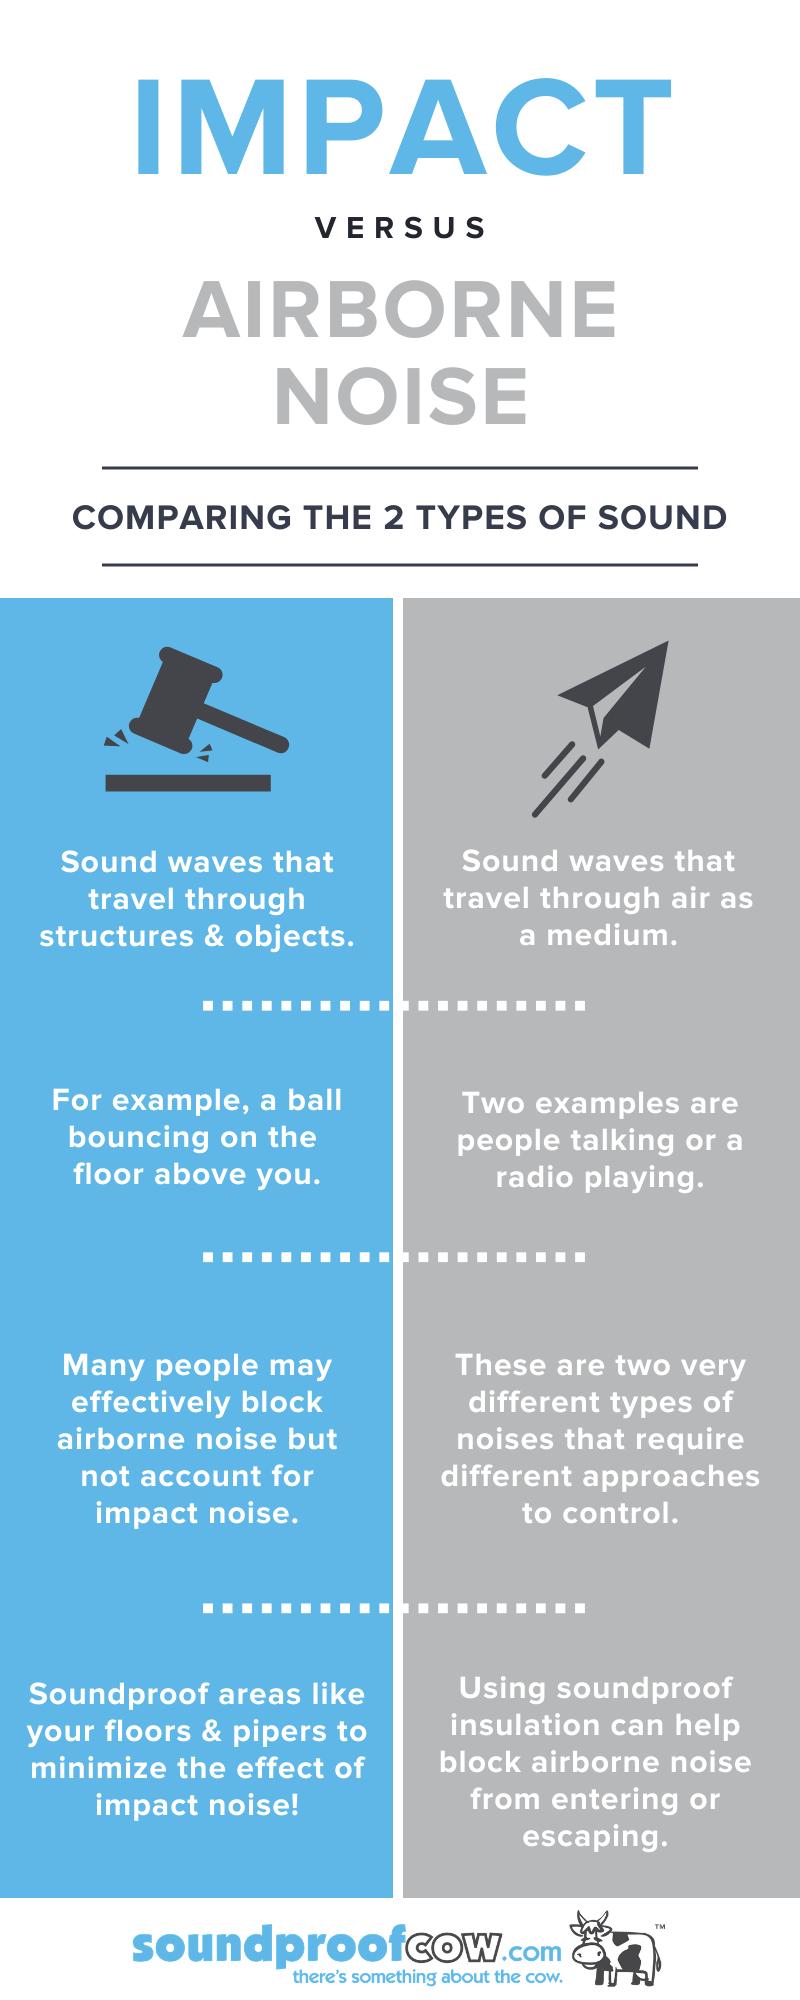 Impact vs Airborne Noise